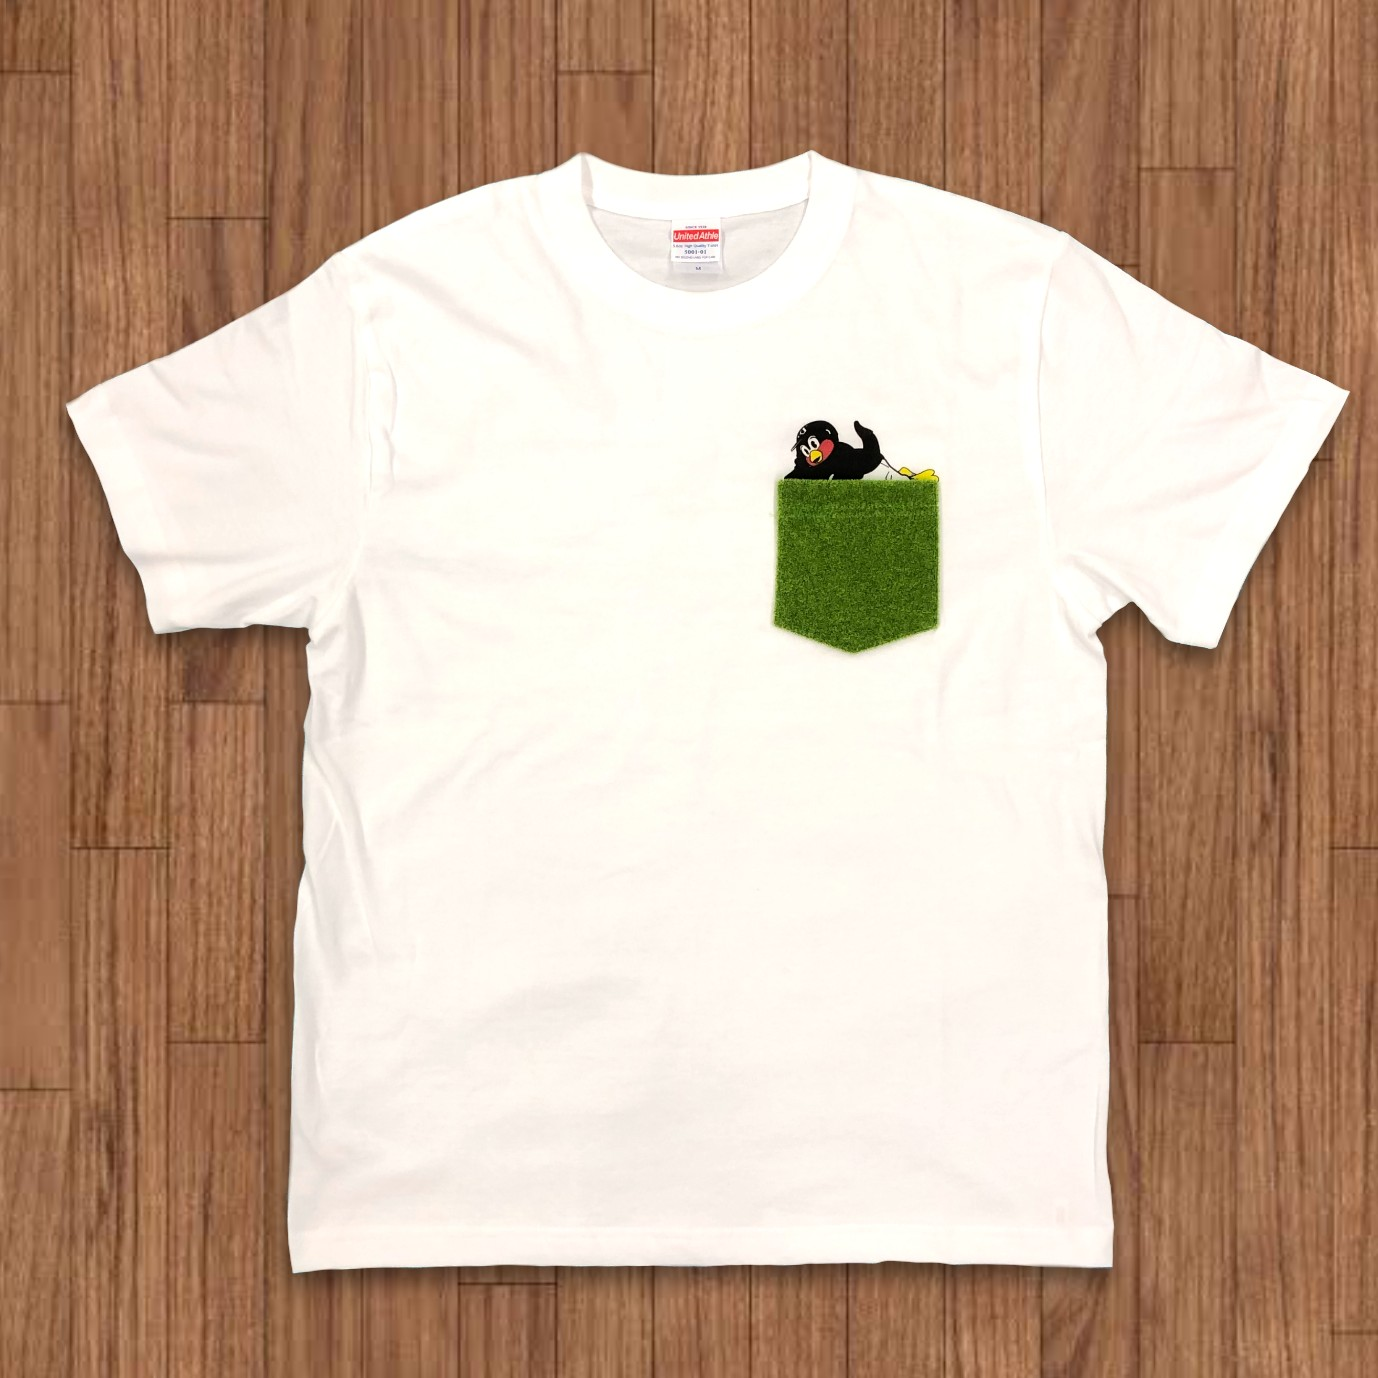 SWALLOWS×Shibaful Tシャツ(ごろん)